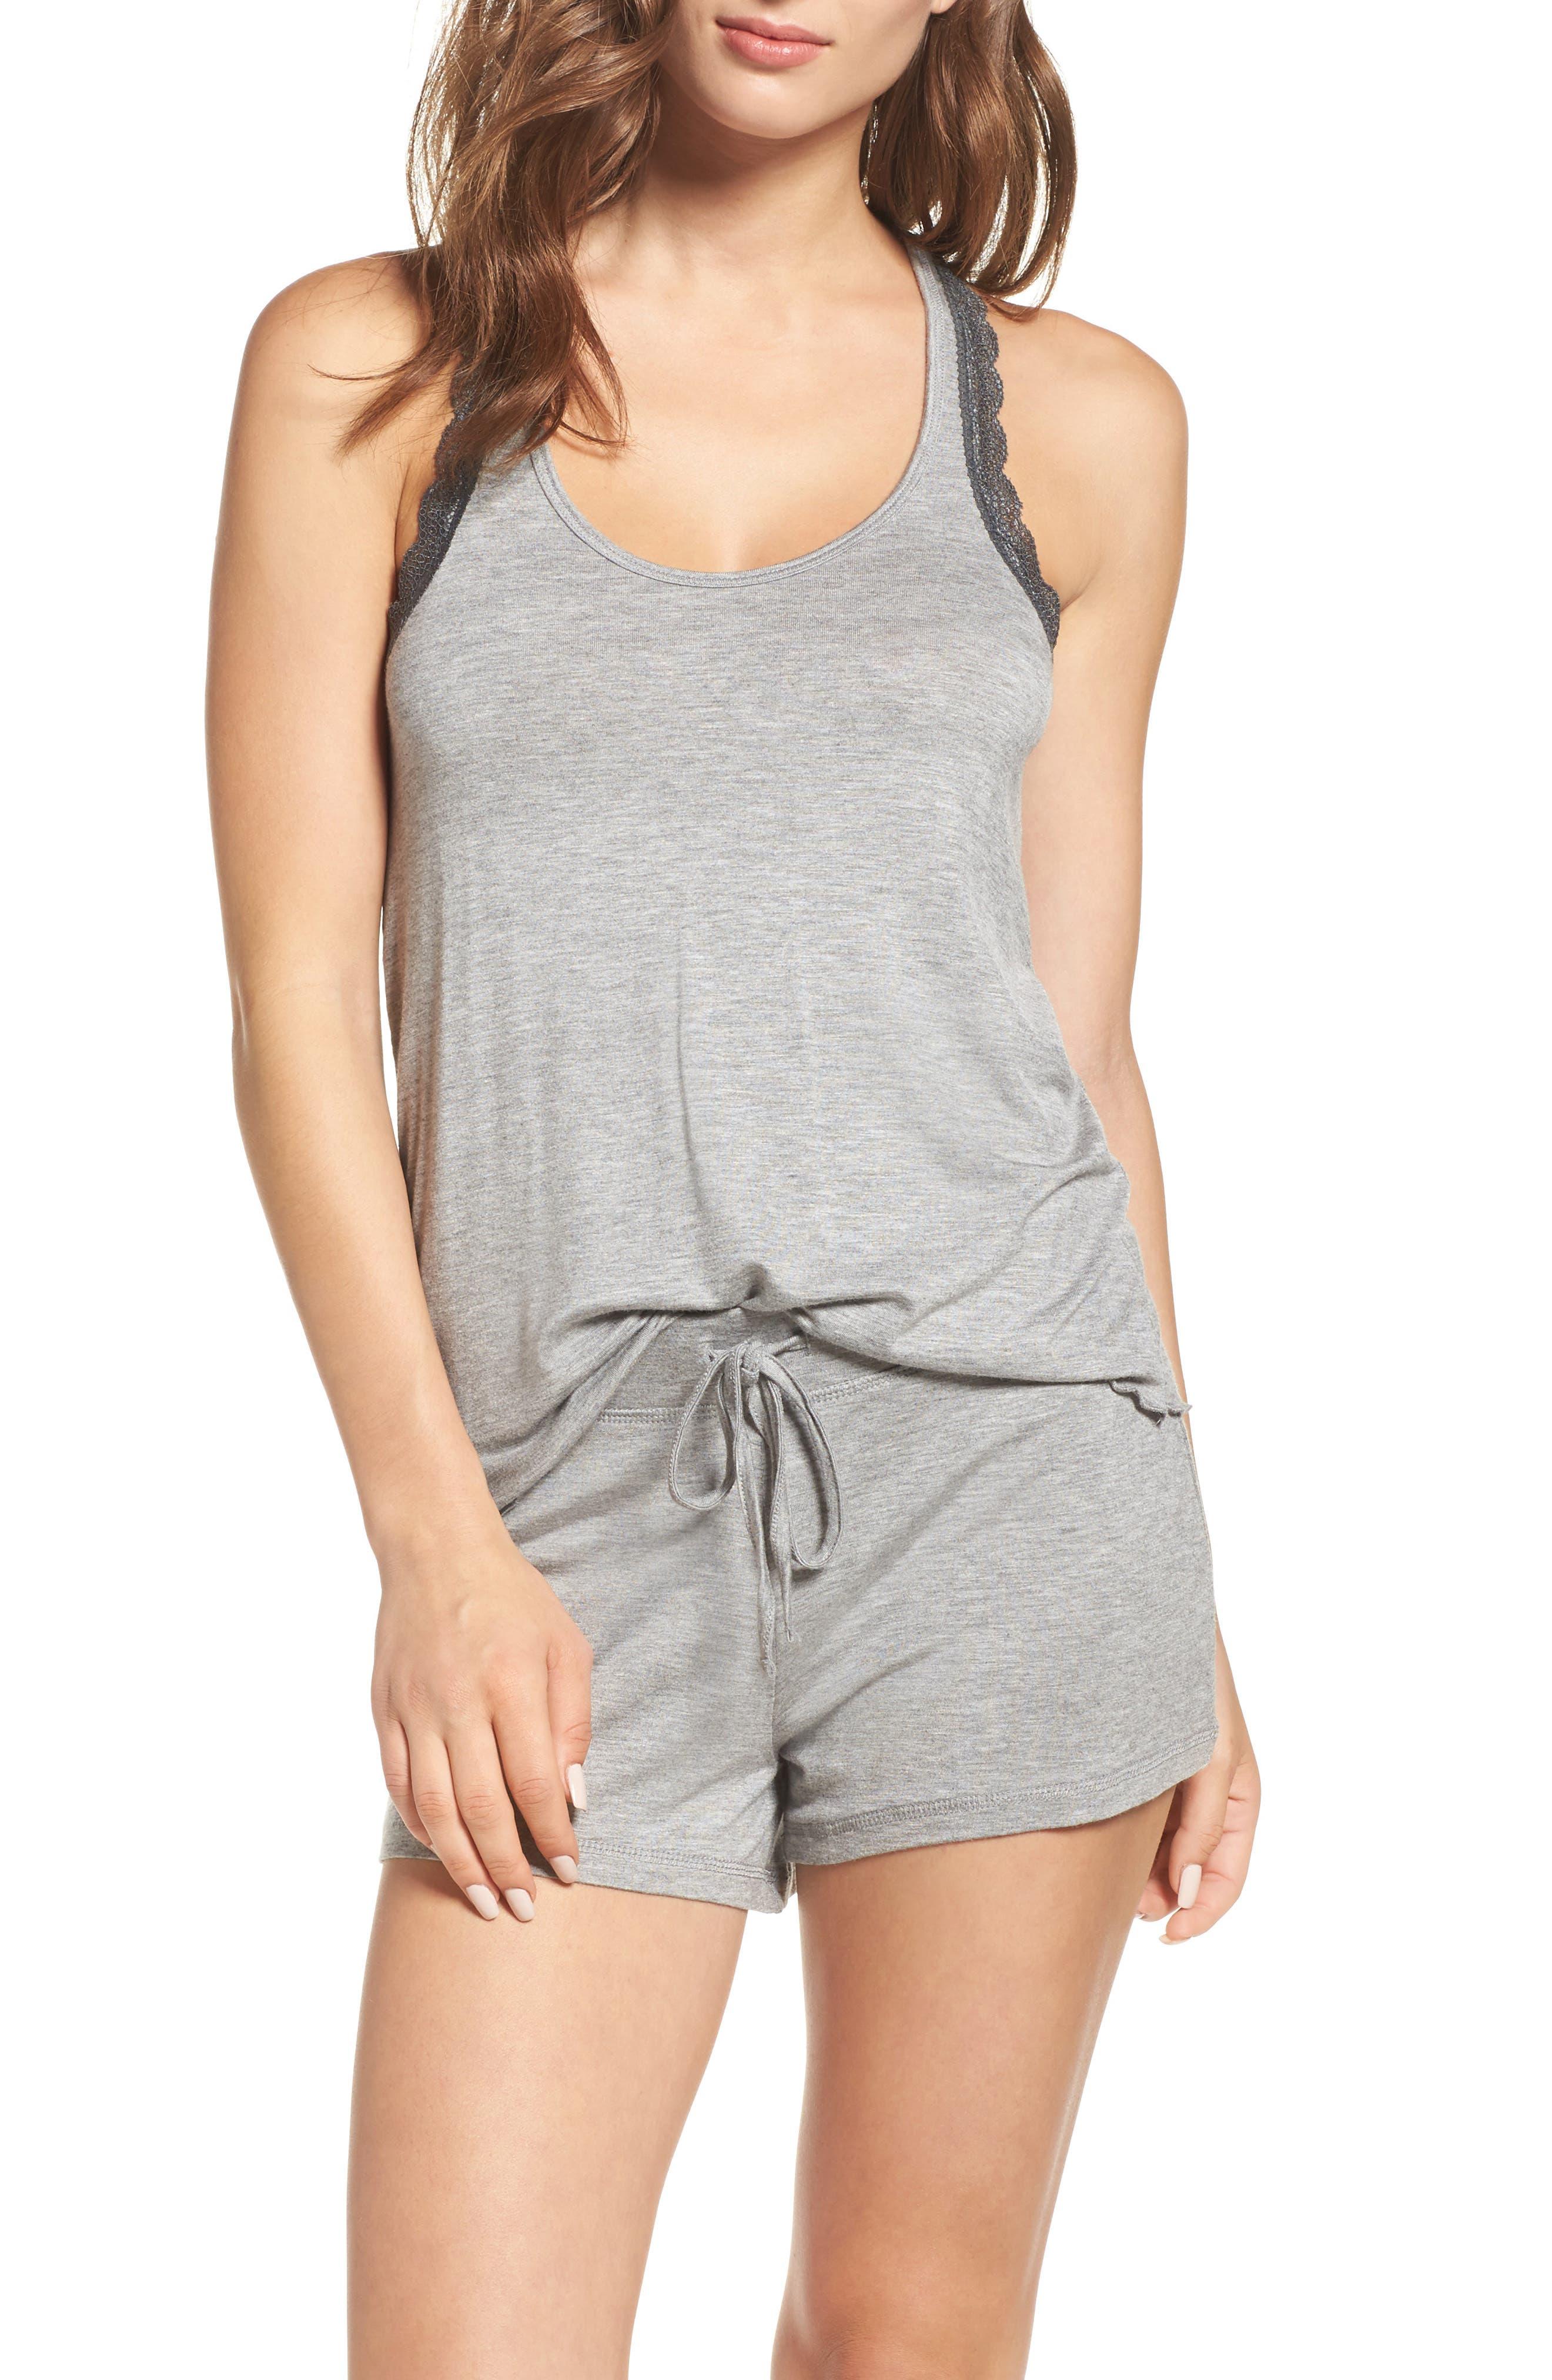 Honeydew Intimates Lace Trim Short Pajamas (2 for $60)